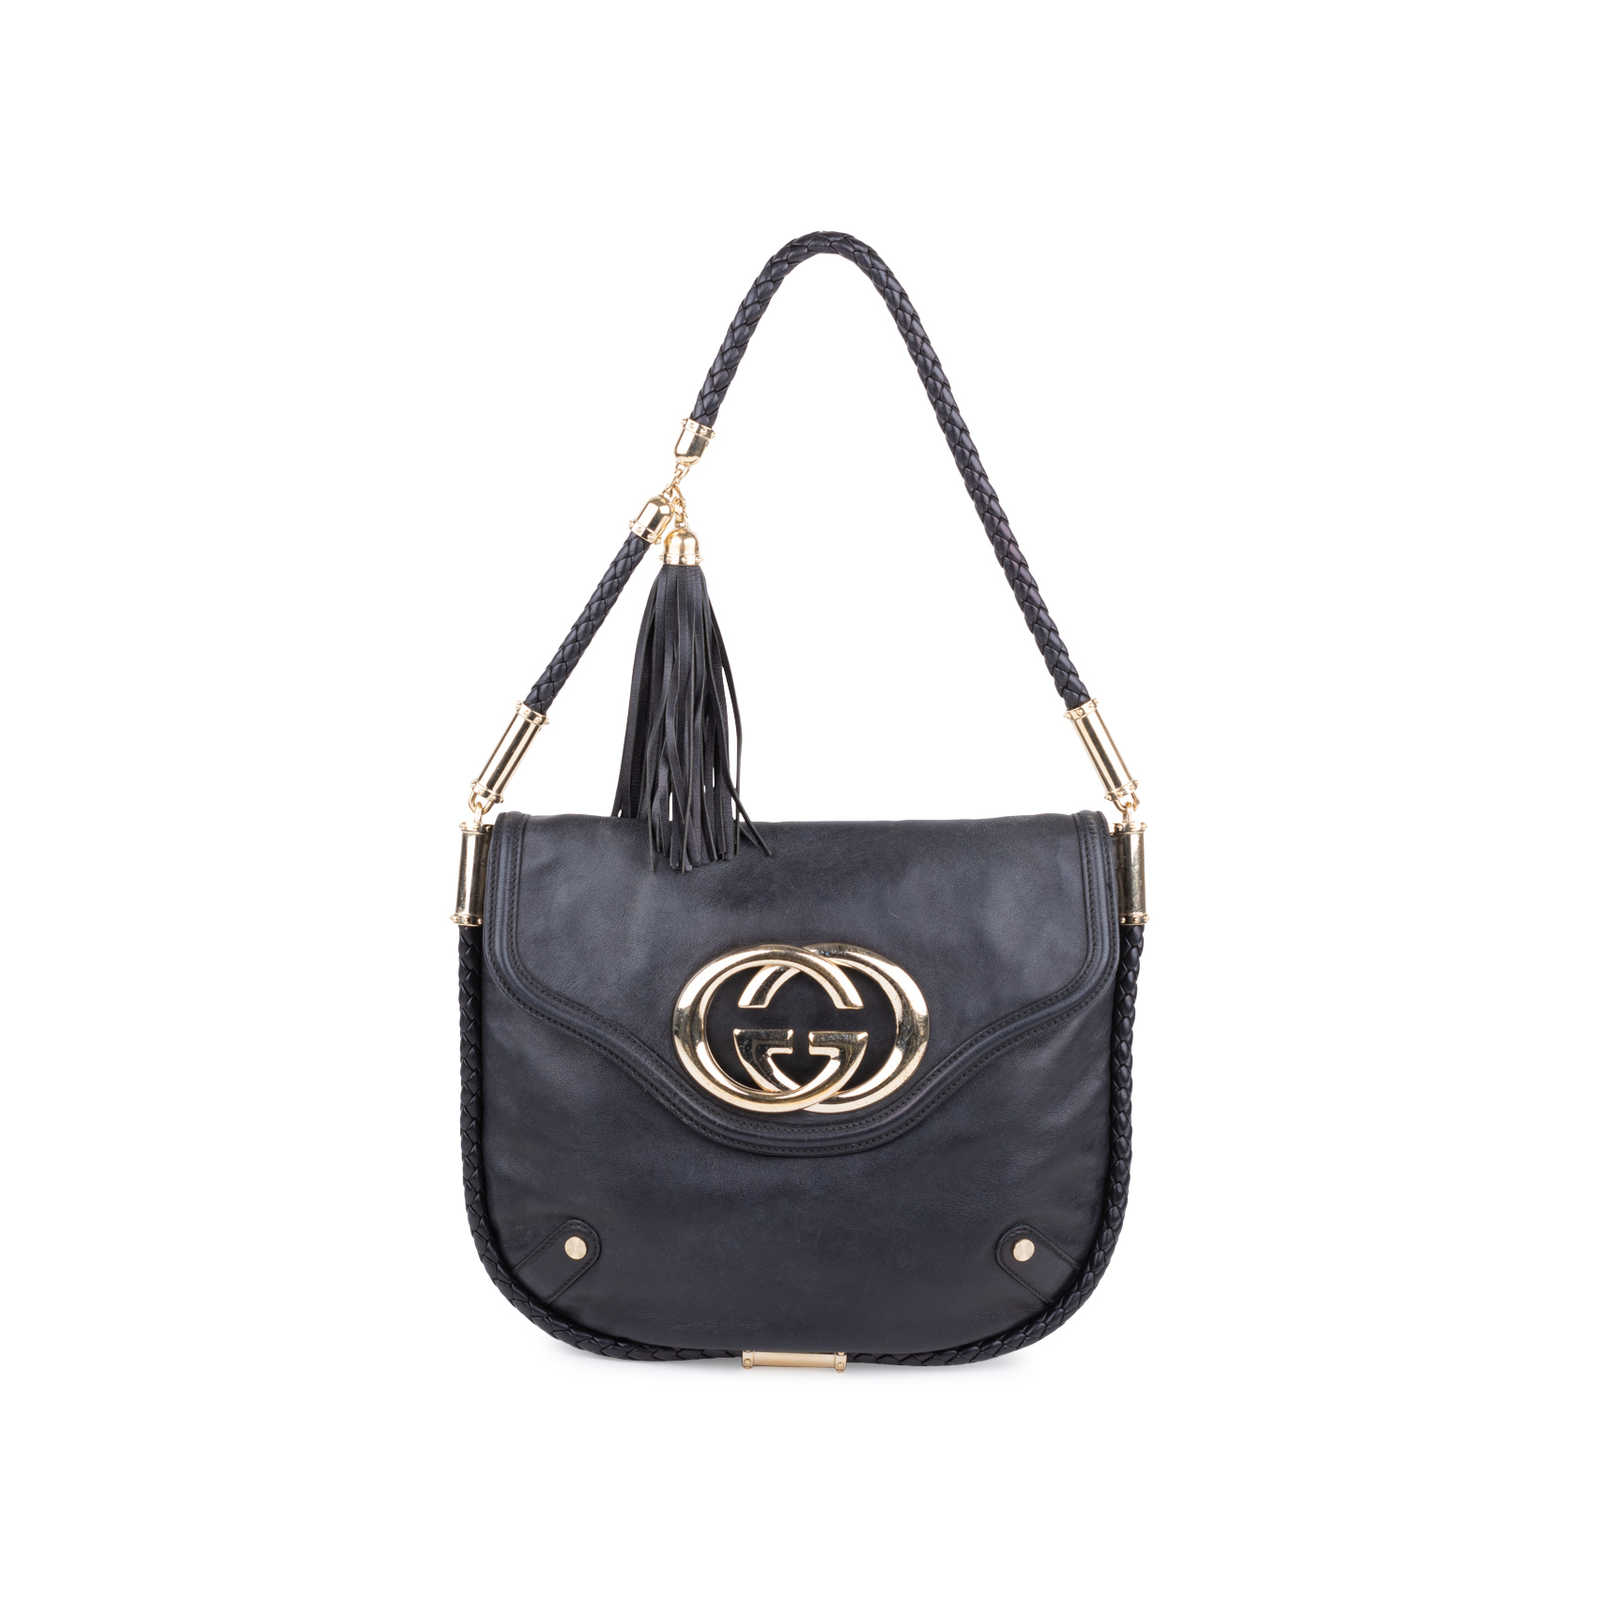 668b2a345da Tap to expand · Authentic Second Hand Gucci Britt Tassel Bag  (PSS-597-00001) - Thumbnail ...